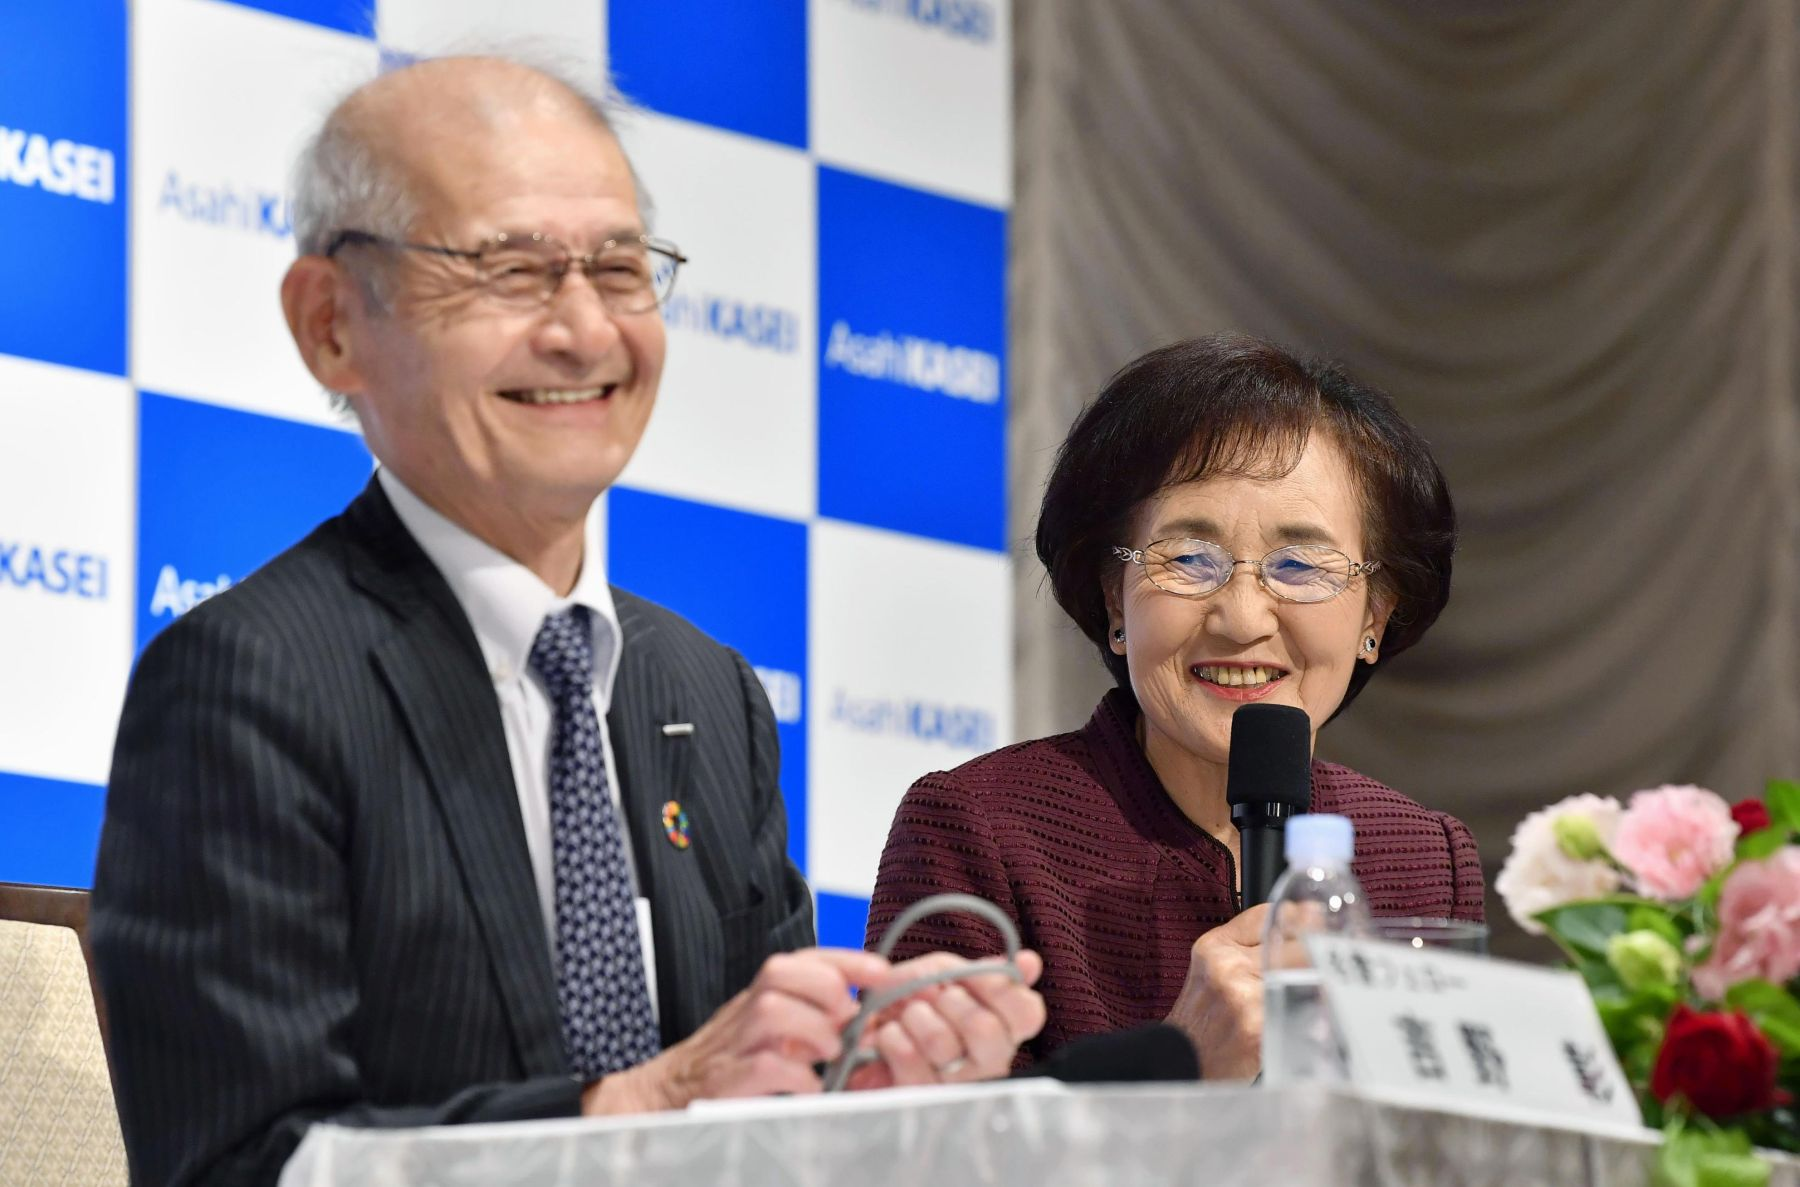 Japanese Akira Yoshino Shares 2019 Nobel Prize in Chemistry Toward a Wireless, Fossil Fuel-Free Society 018